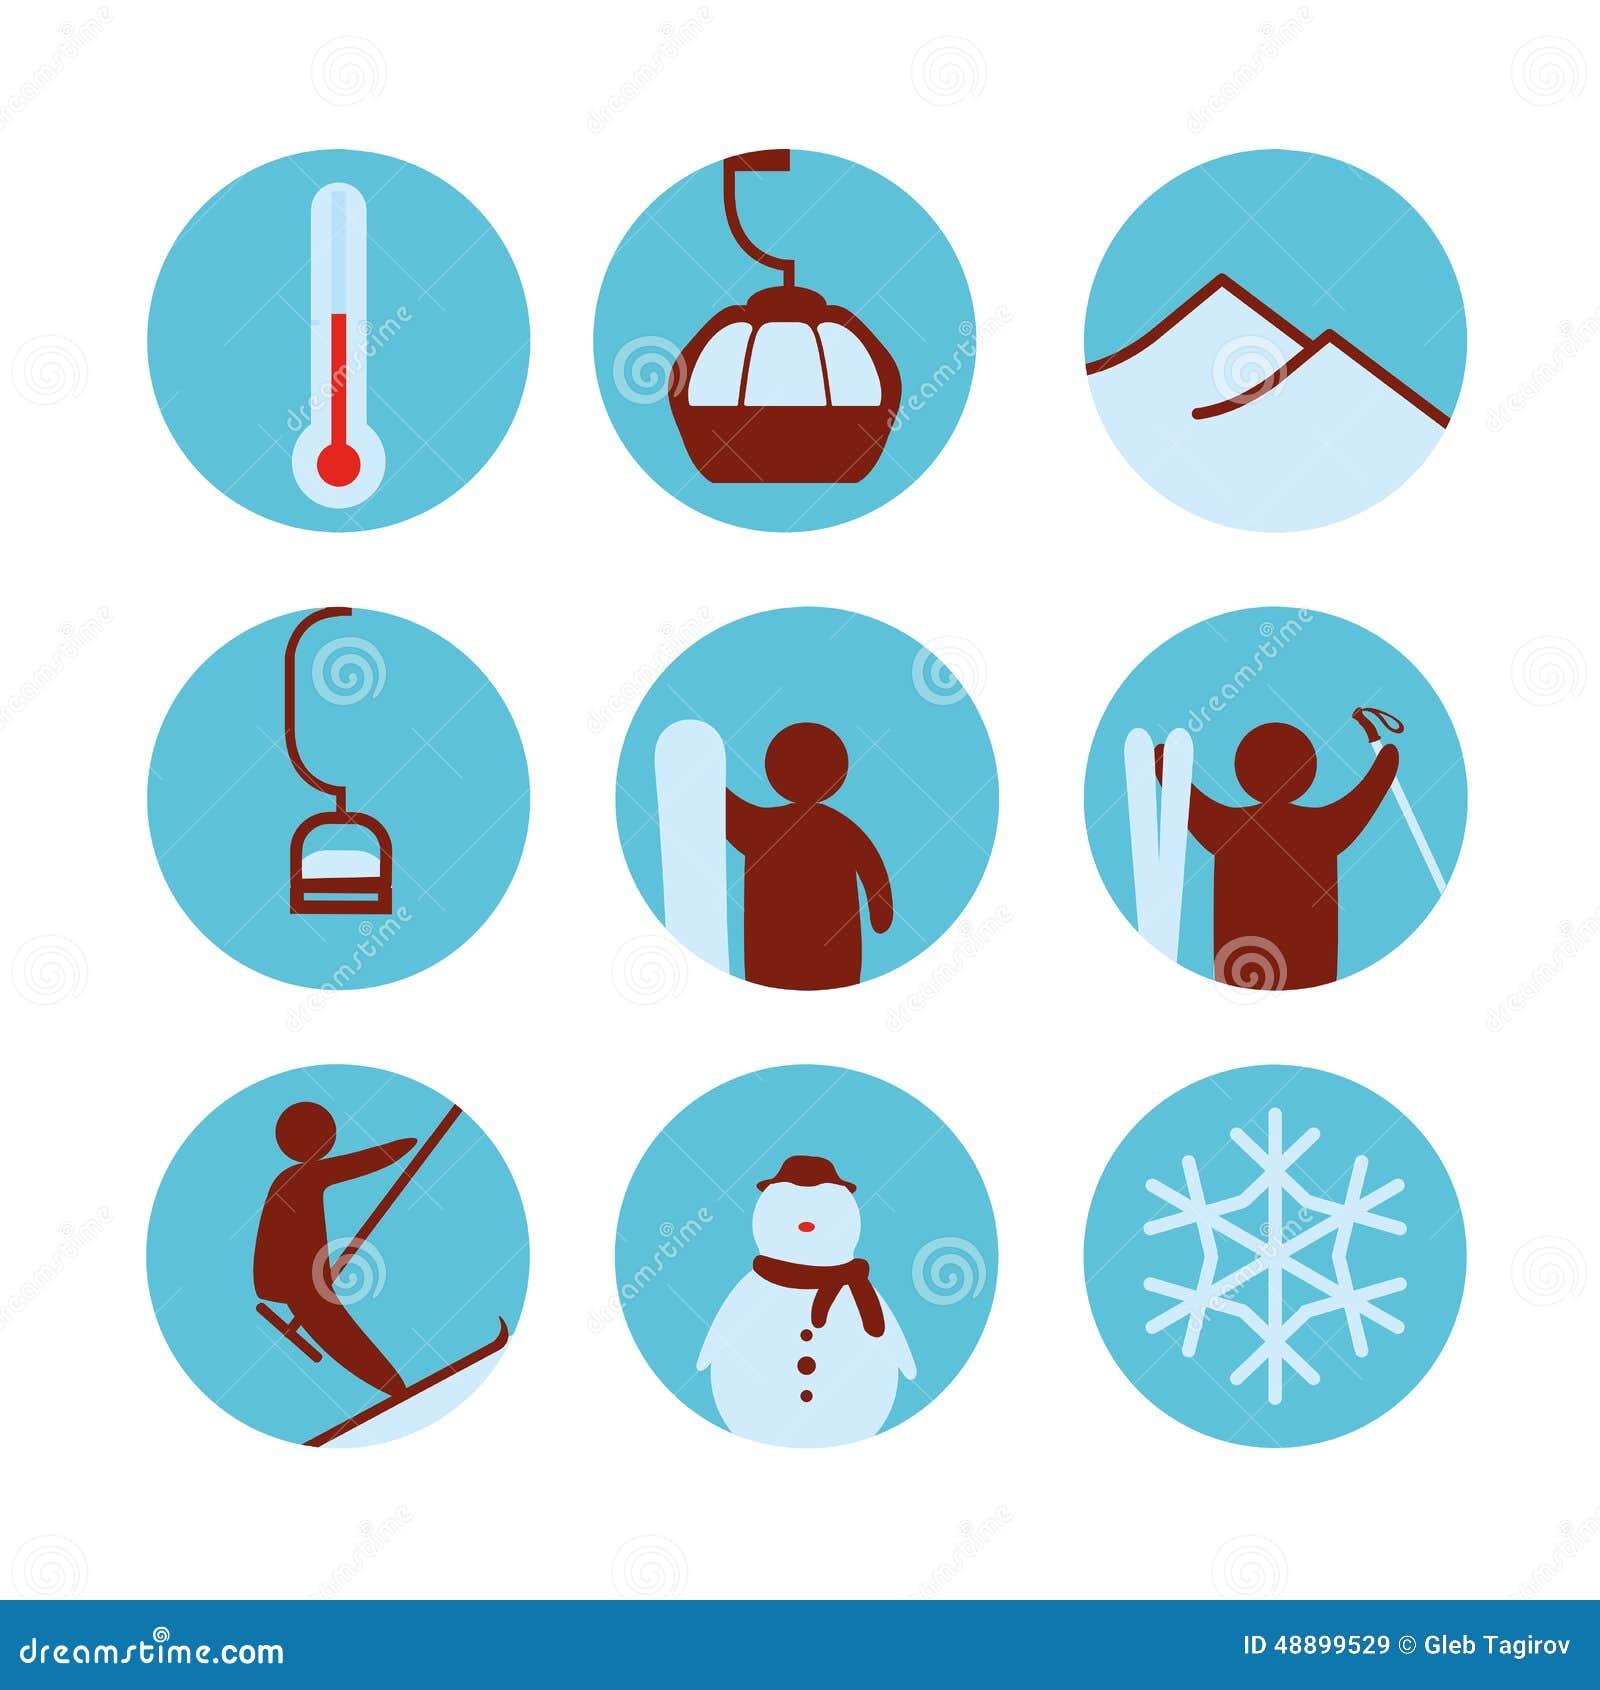 Winter icon, ski, snowman. EPS10 vector format.